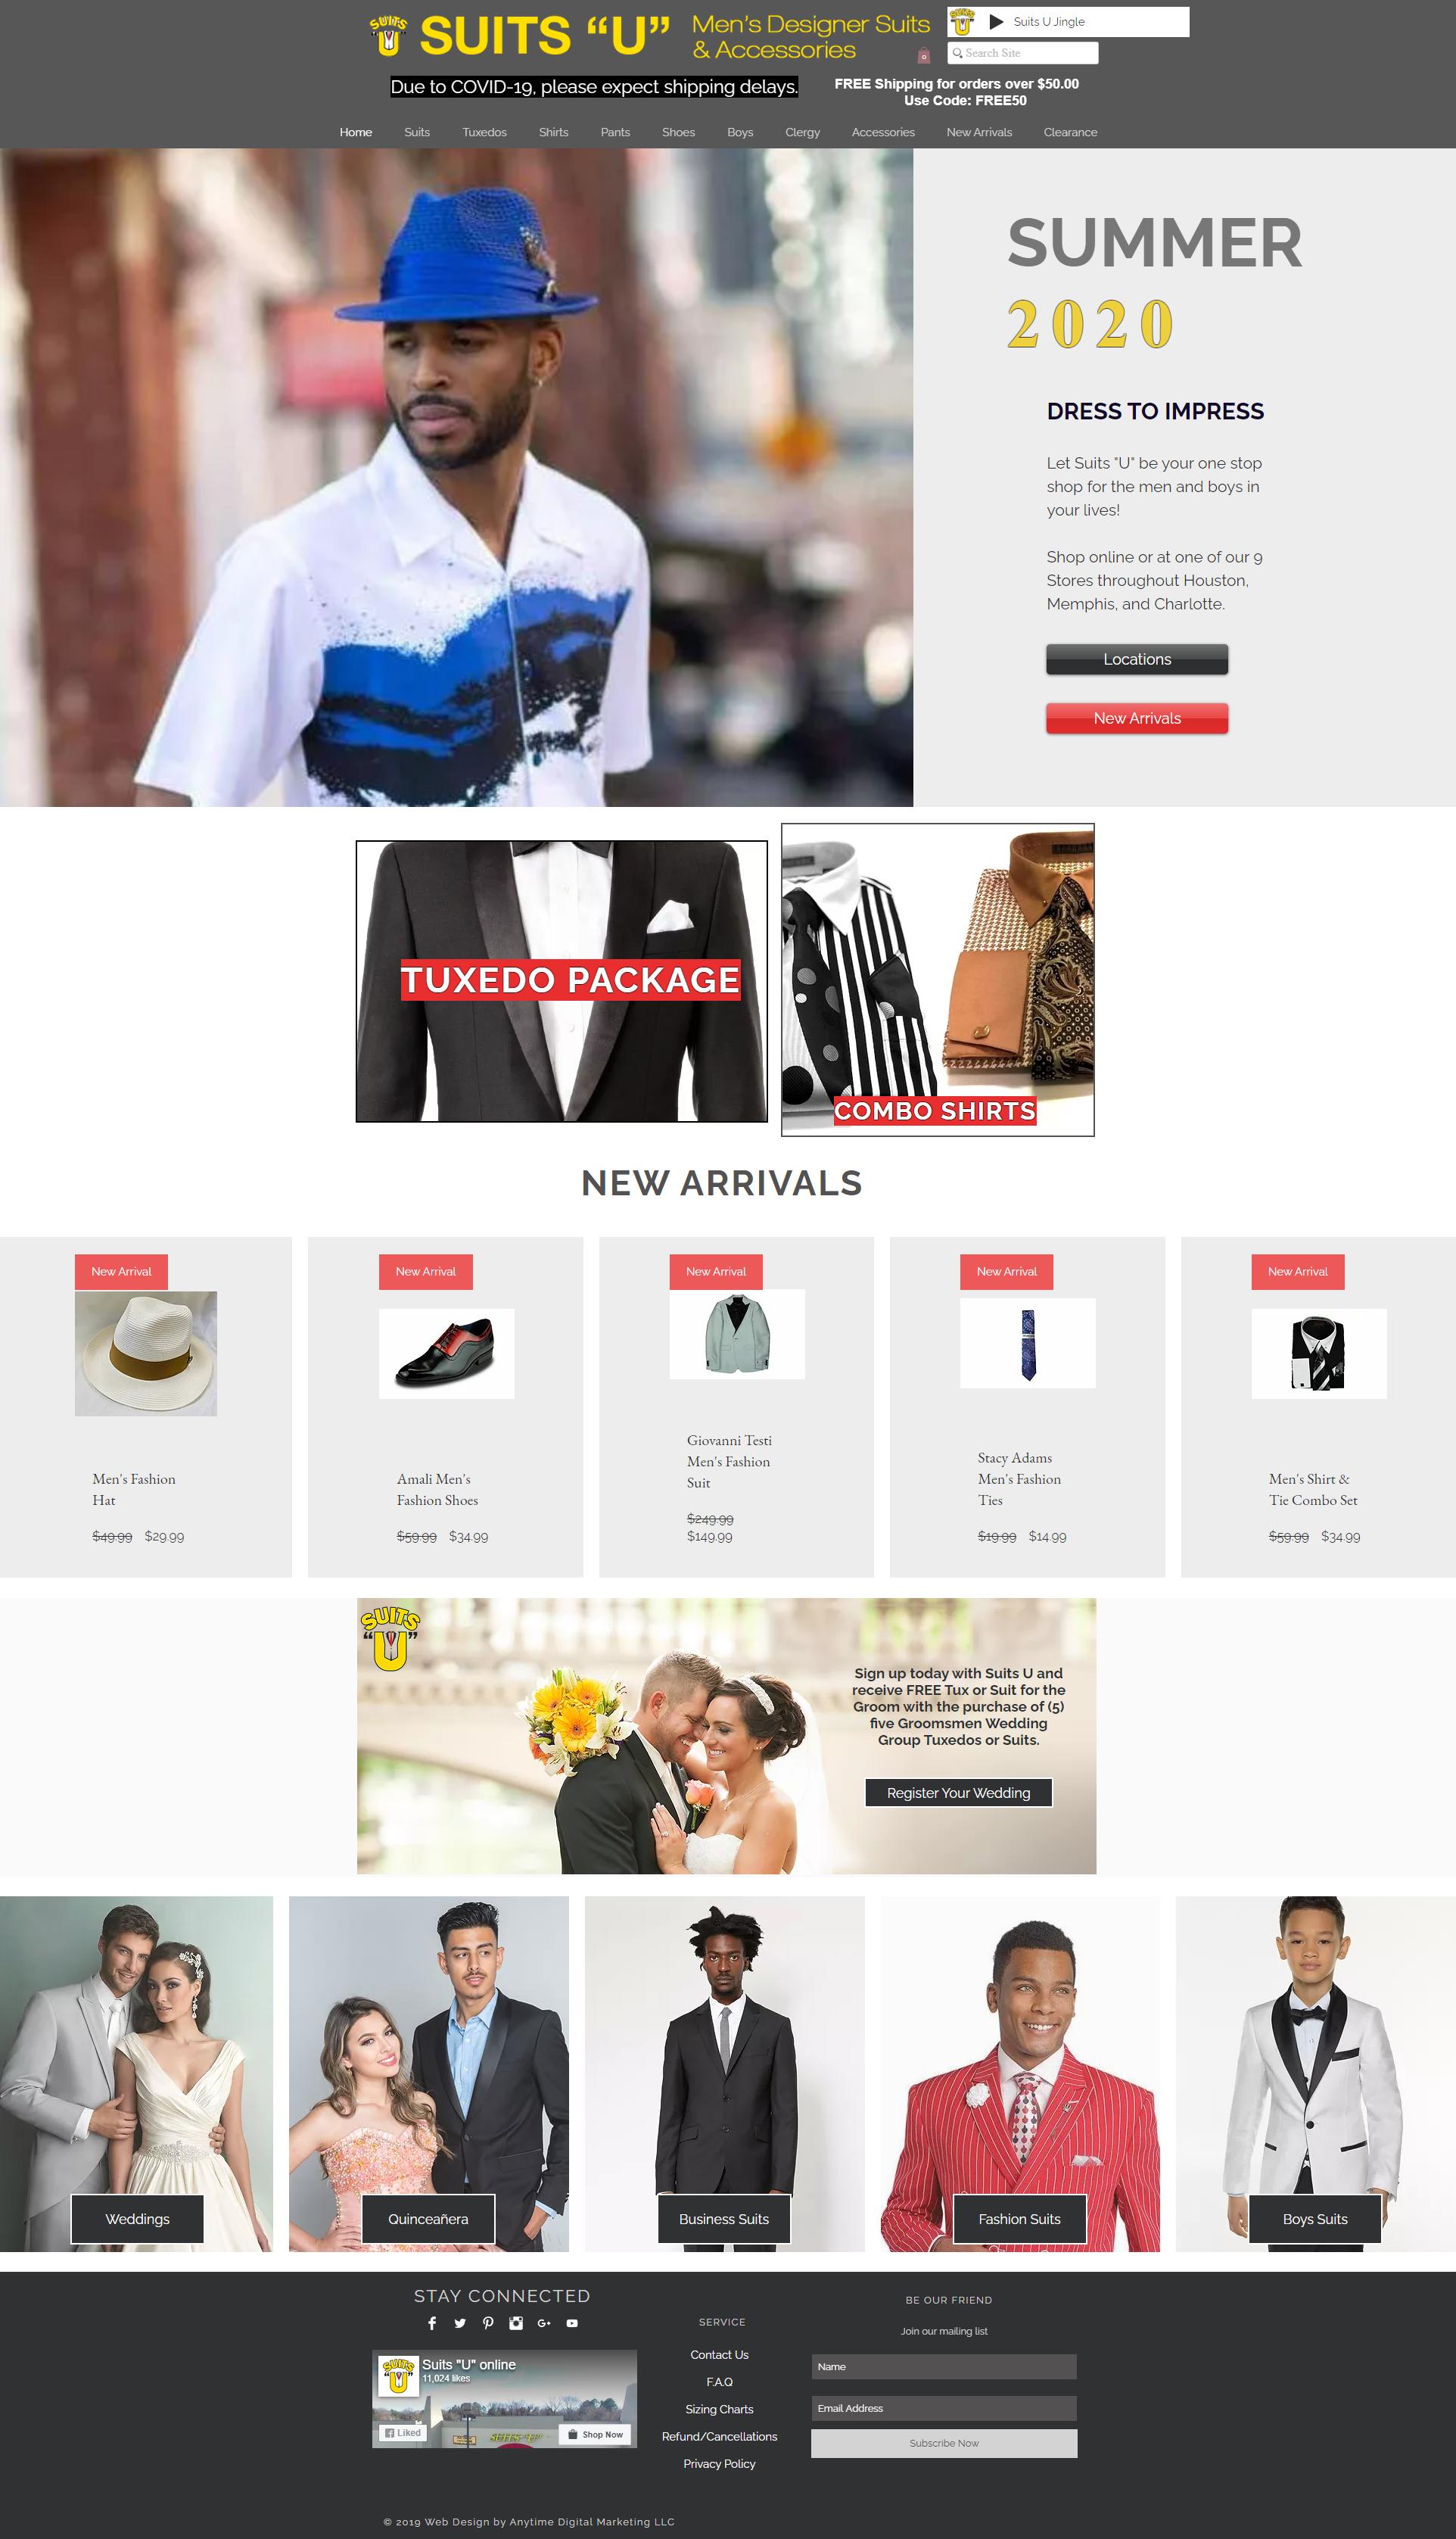 Suits U ecommerce website design